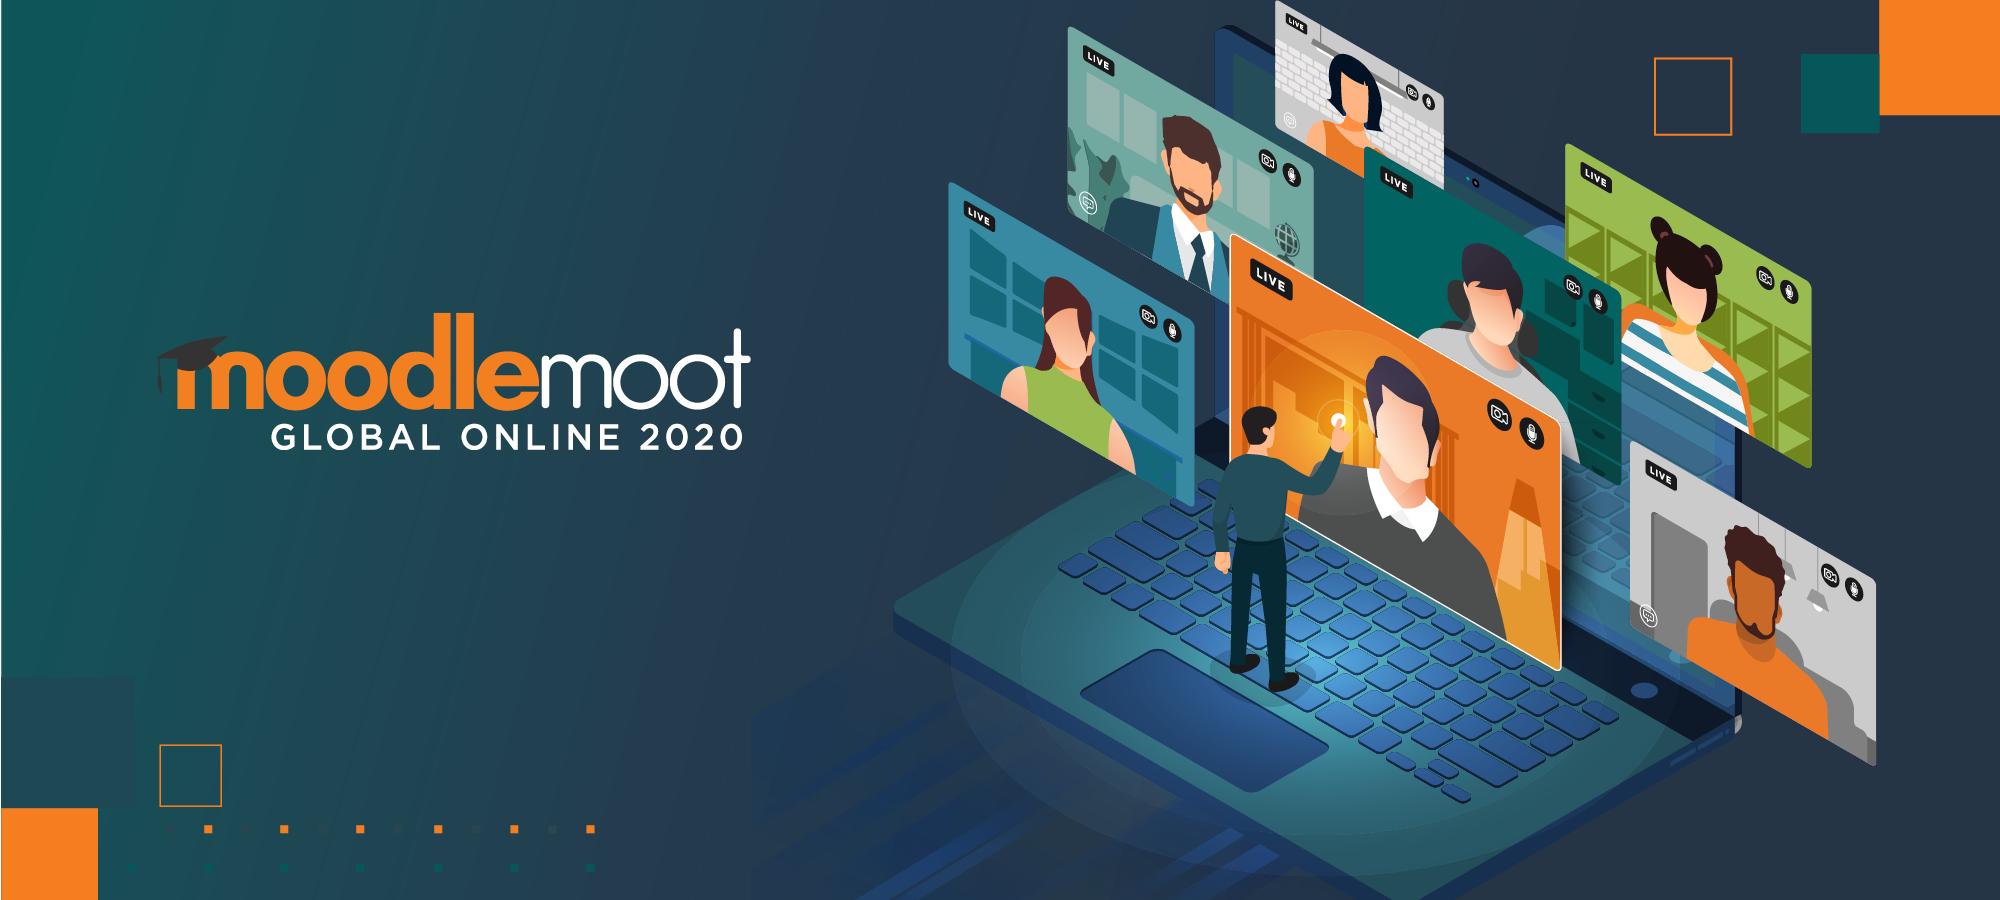 Moodle Moot Global Online